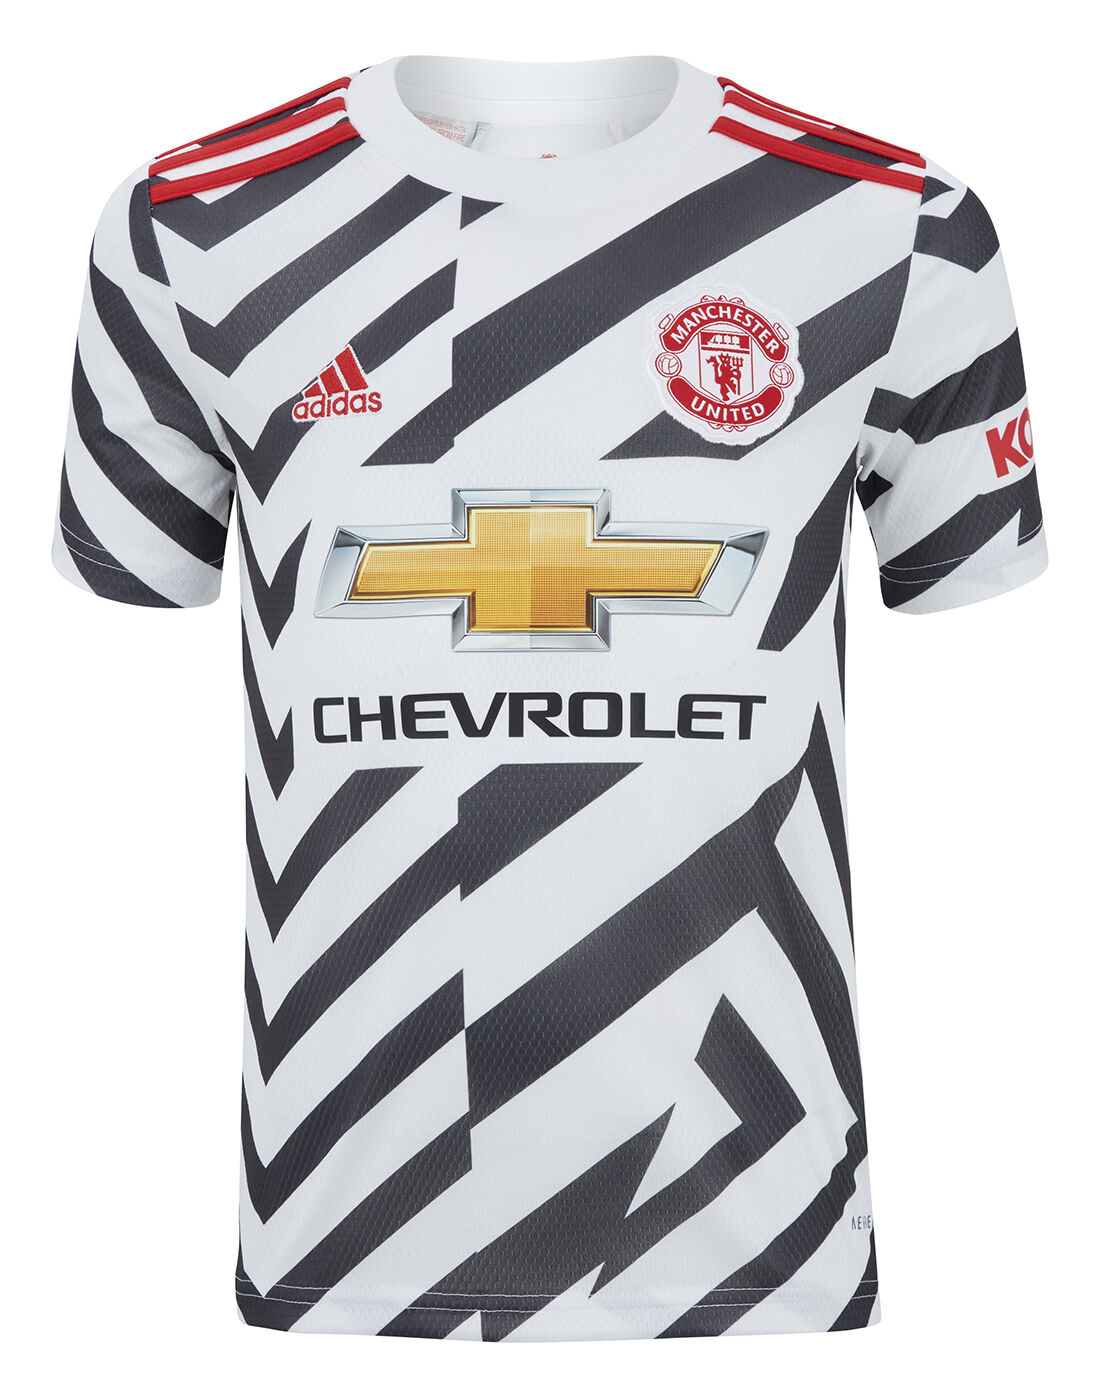 adidas adidas hamburg black mono gum in mouth and back   Kids Man Utd 20/21 Third Jersey